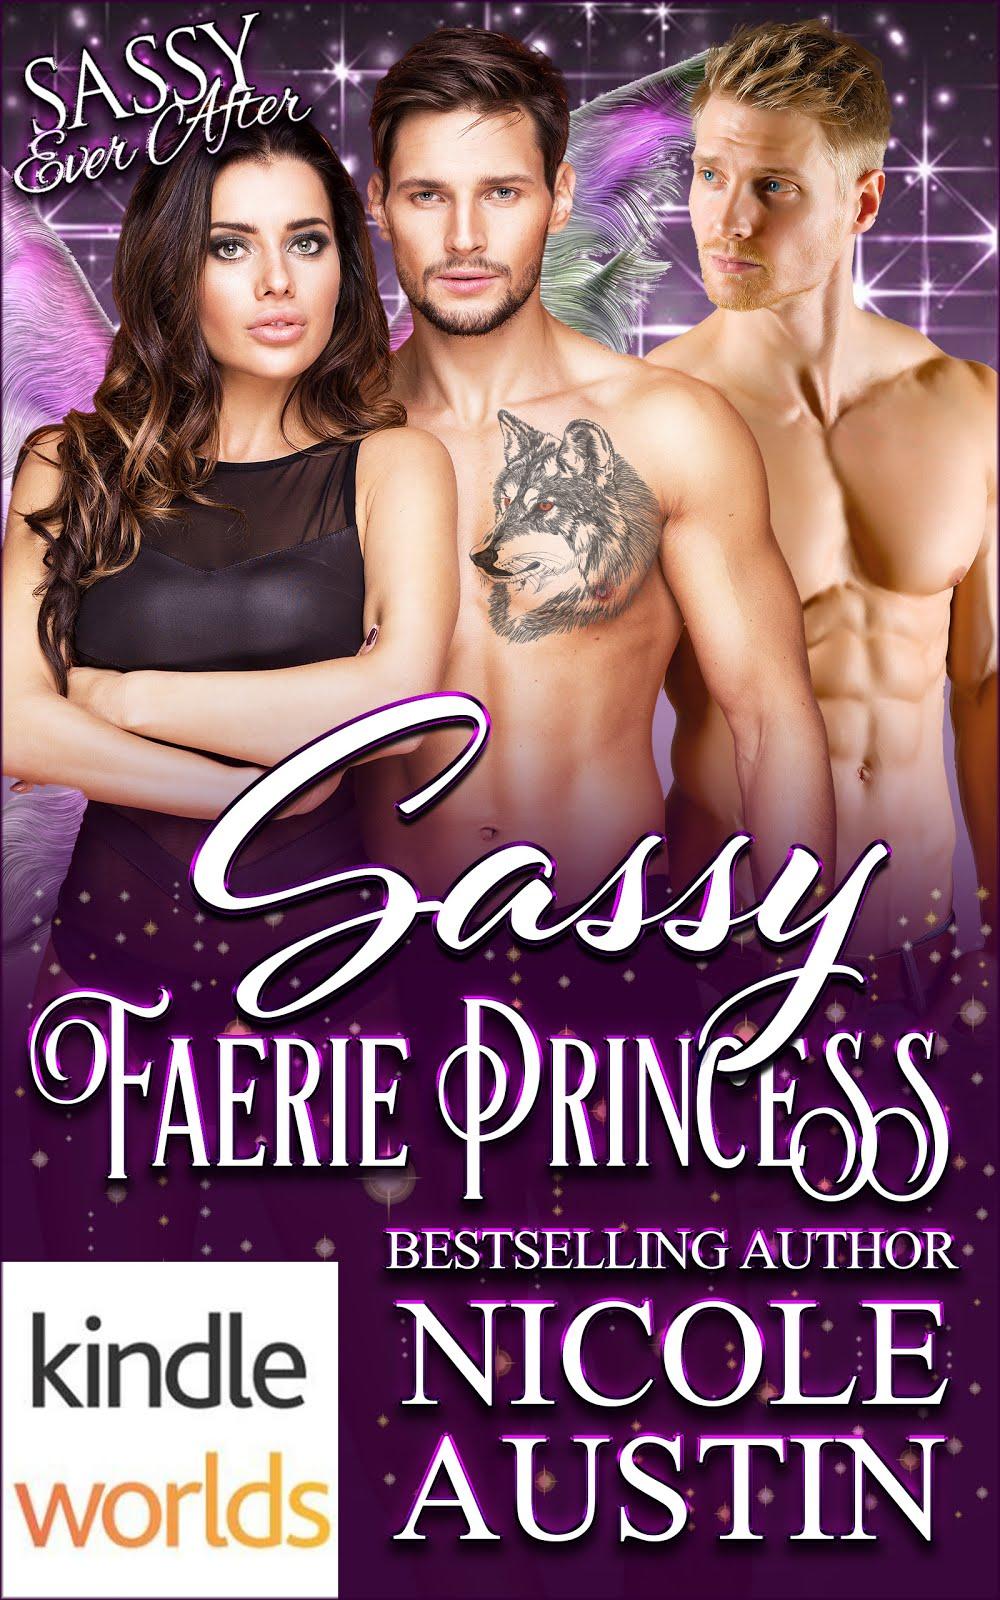 Sassy Faerie Princess